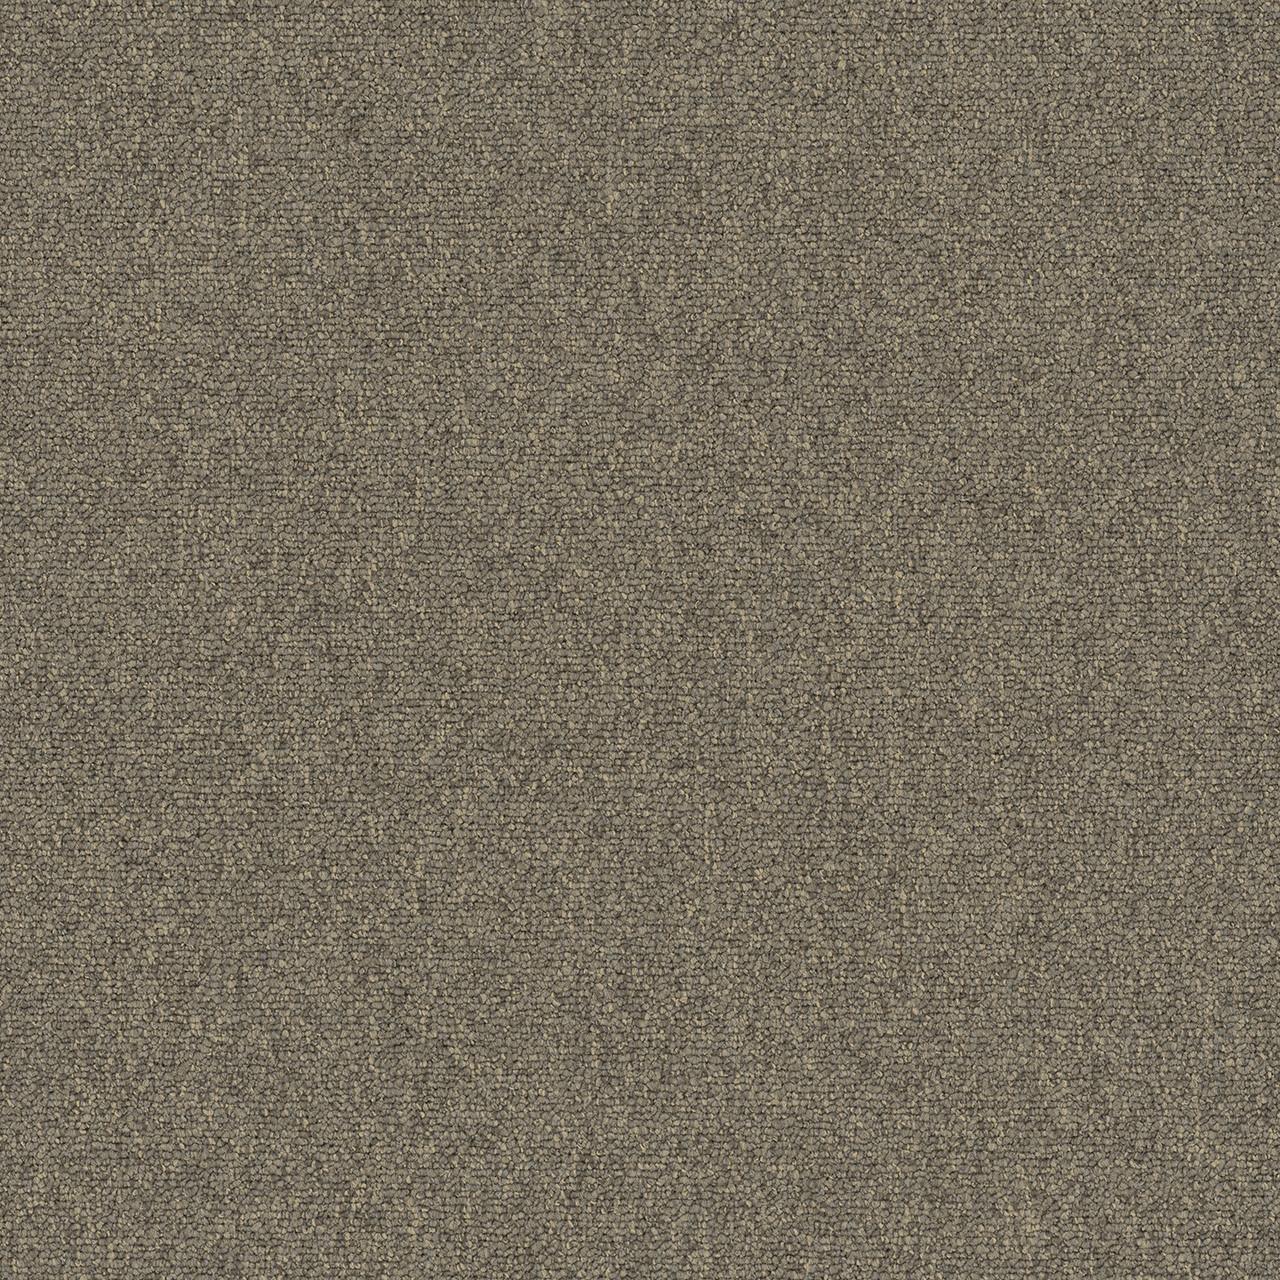 "Pentz Diversified Carpet Tile Off Beat 24"" x 24"" Premium (72 sq ft/ctn)"